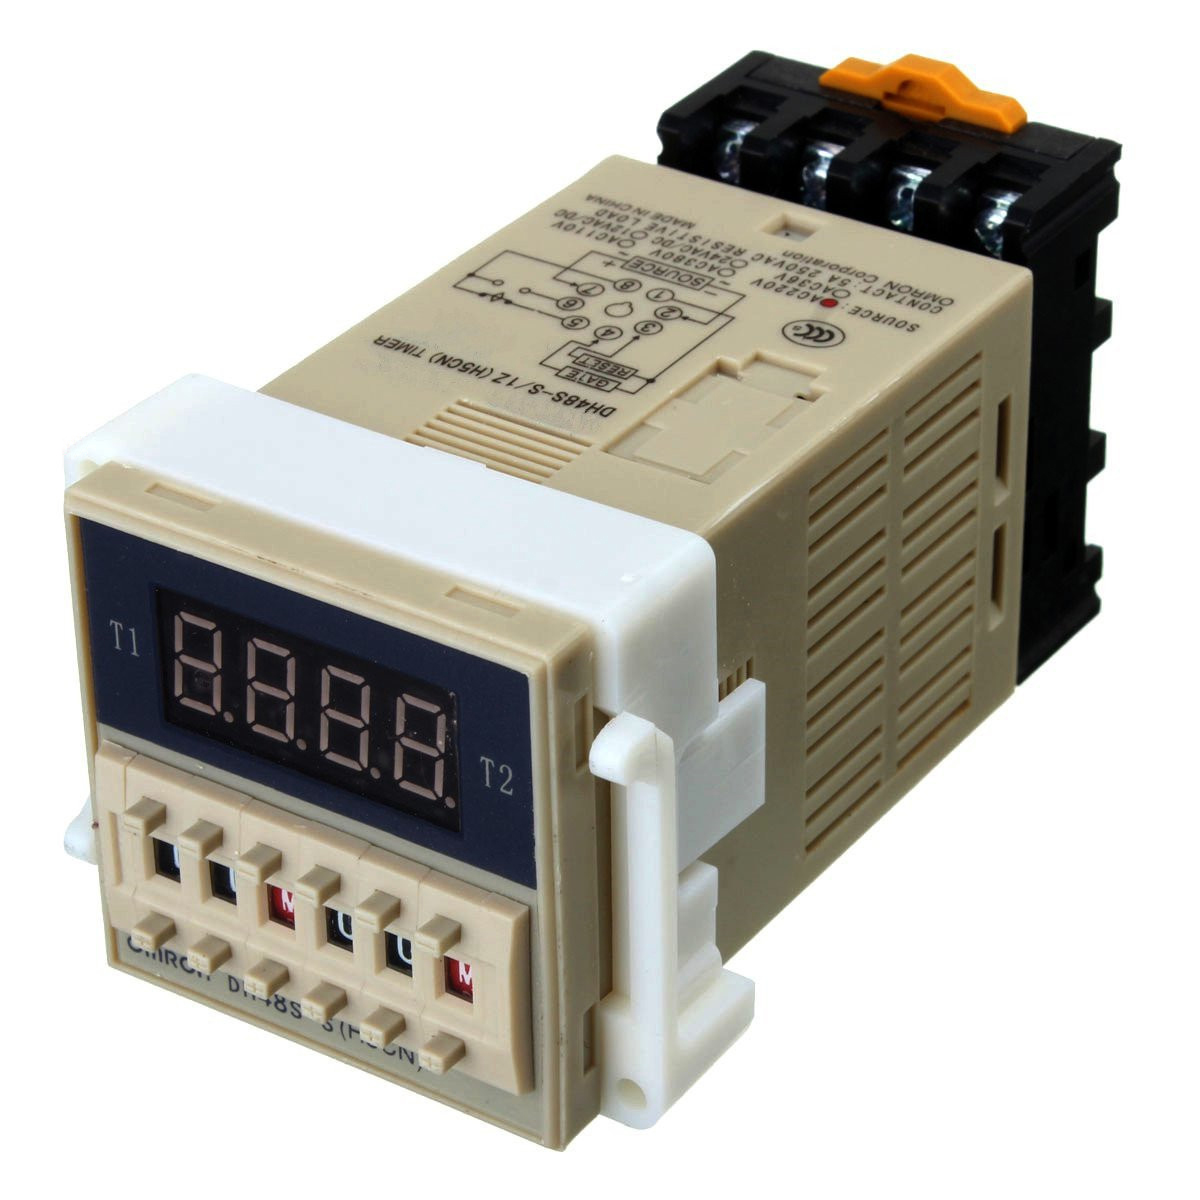 THGS AC 220 v 5A Programmierbare Doppel Zeit Timer Verzögerung Relais Gerät Werkzeug DH48S-S